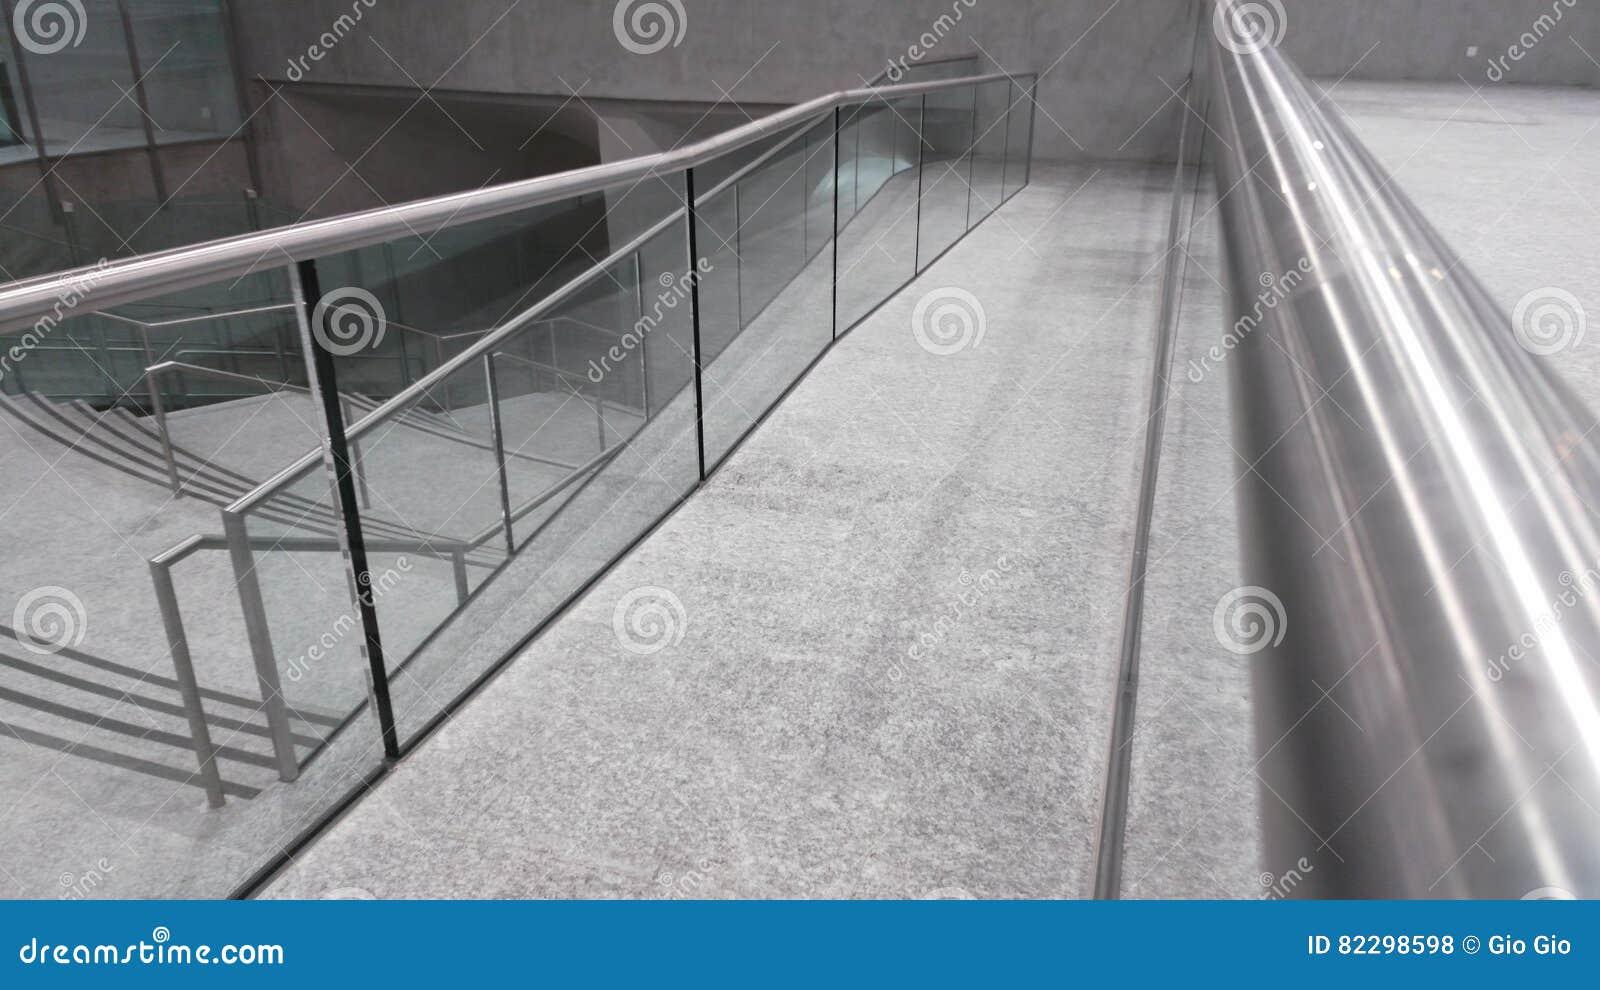 Station handrail